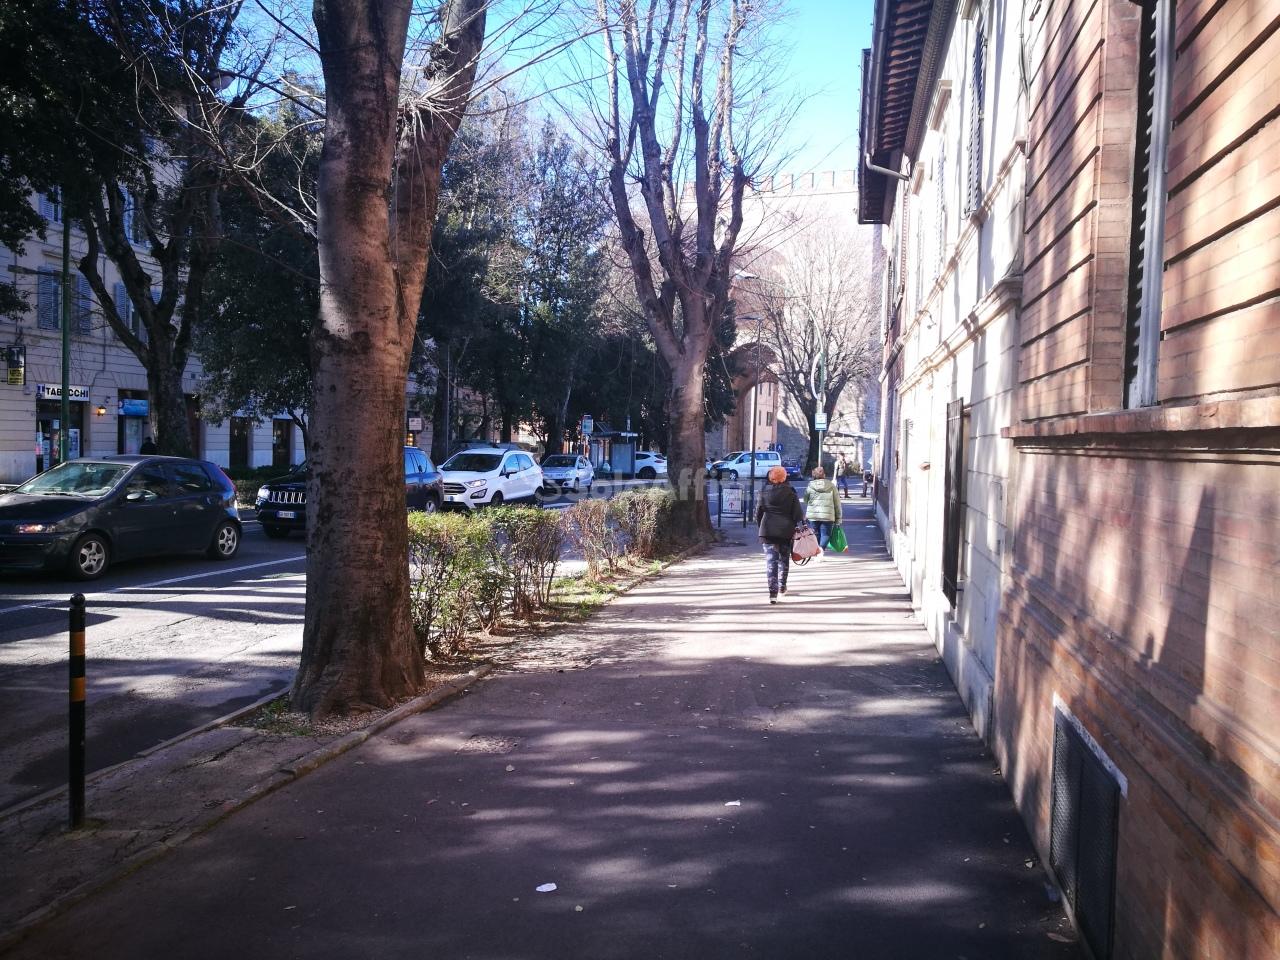 Fondo/negozio - 1 vetrina/luce a Antiporto, Siena